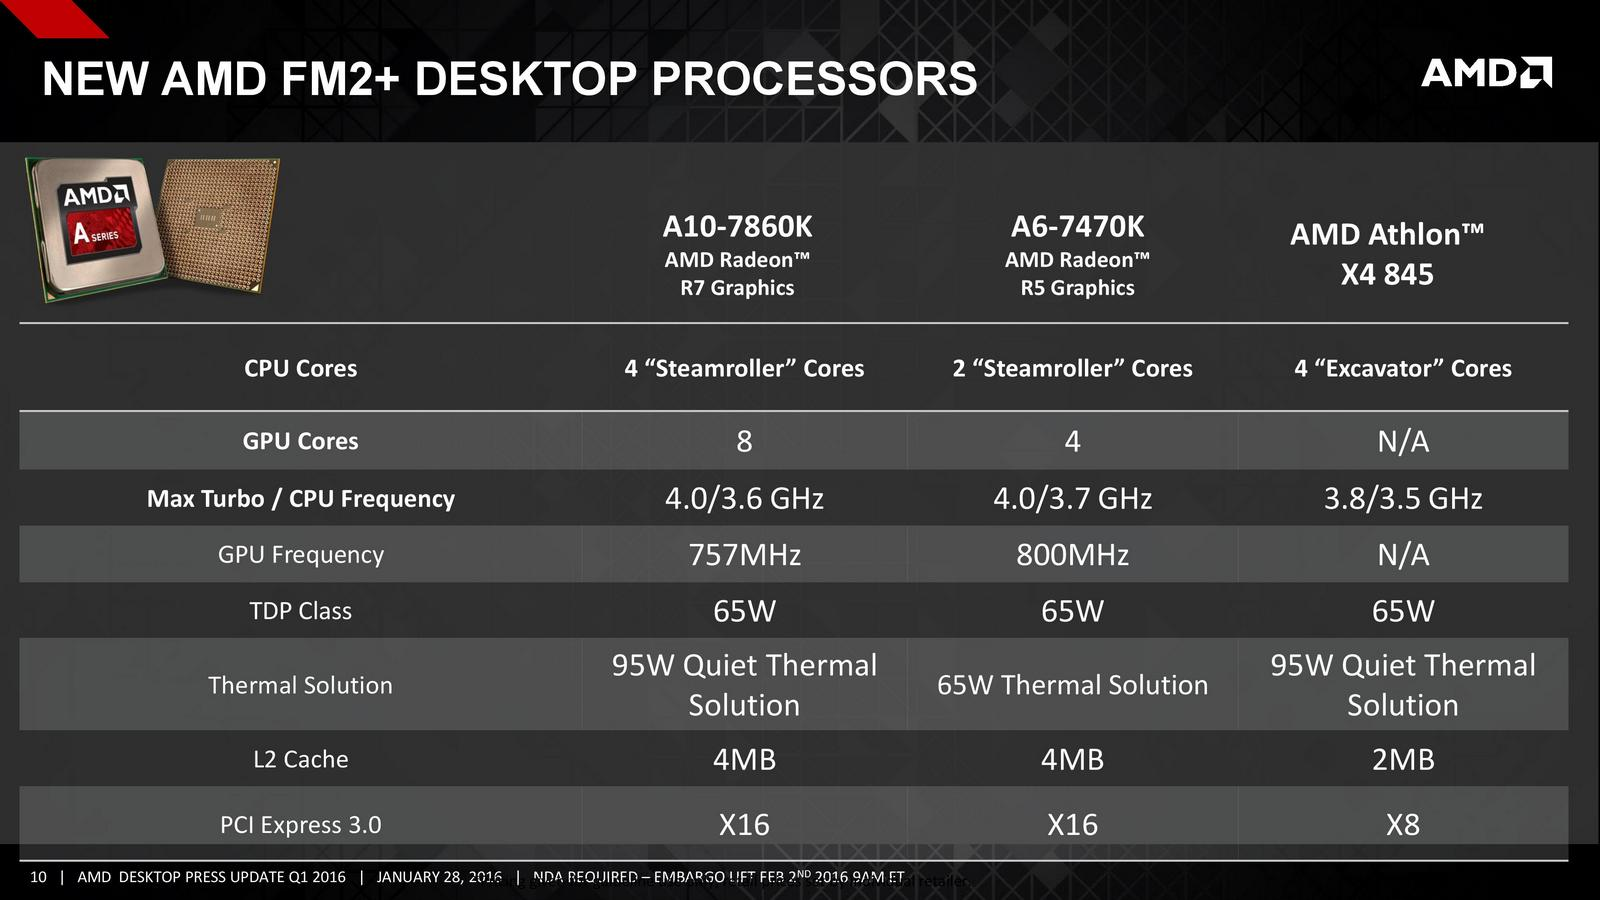 AMD Feb2 Desktop Processor Update - PRESS DECK - legally approved_v2-page-010